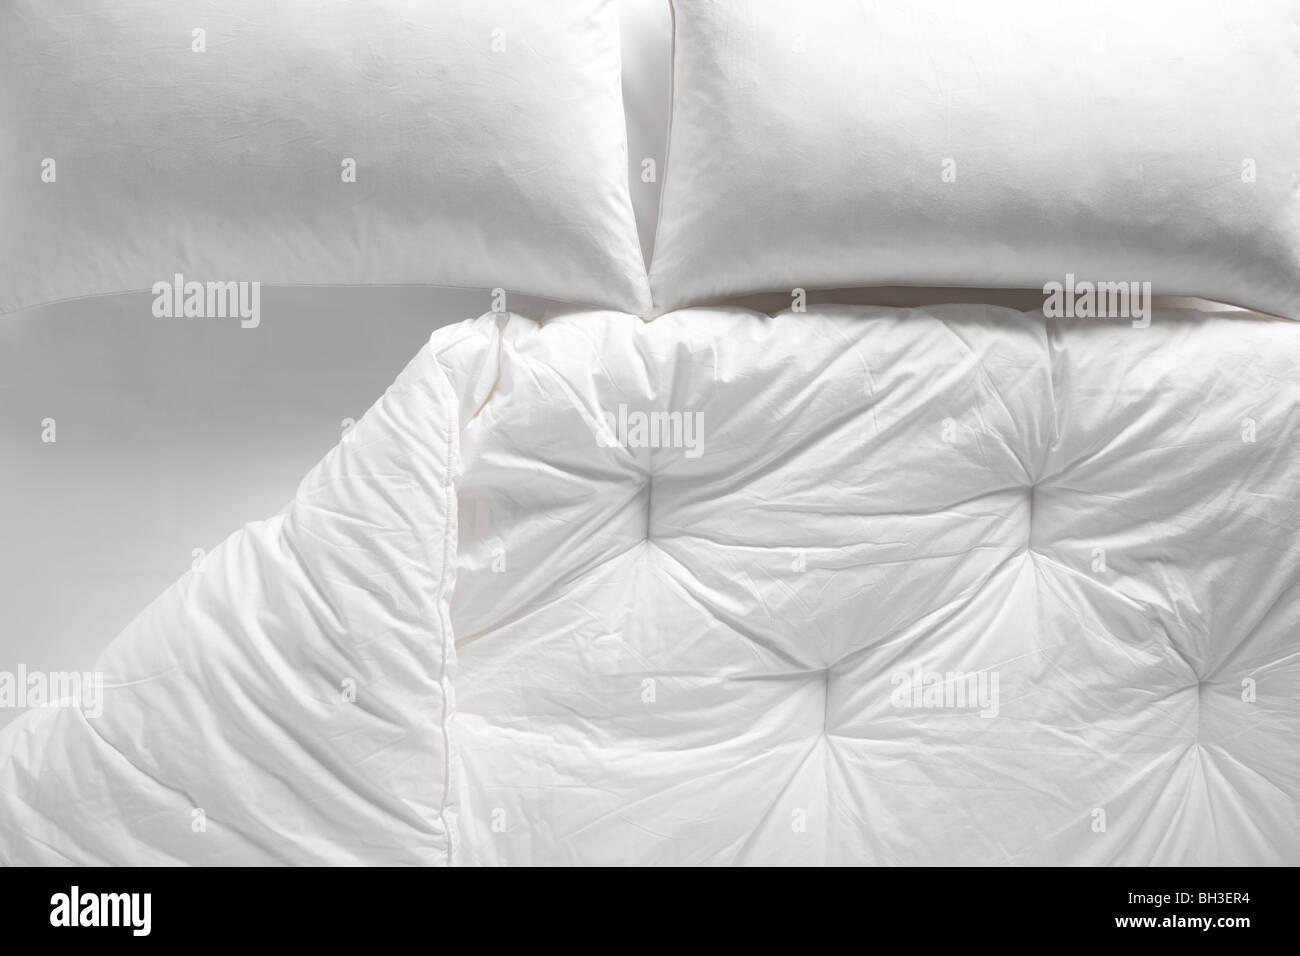 duvet stockfotos duvet bilder alamy. Black Bedroom Furniture Sets. Home Design Ideas